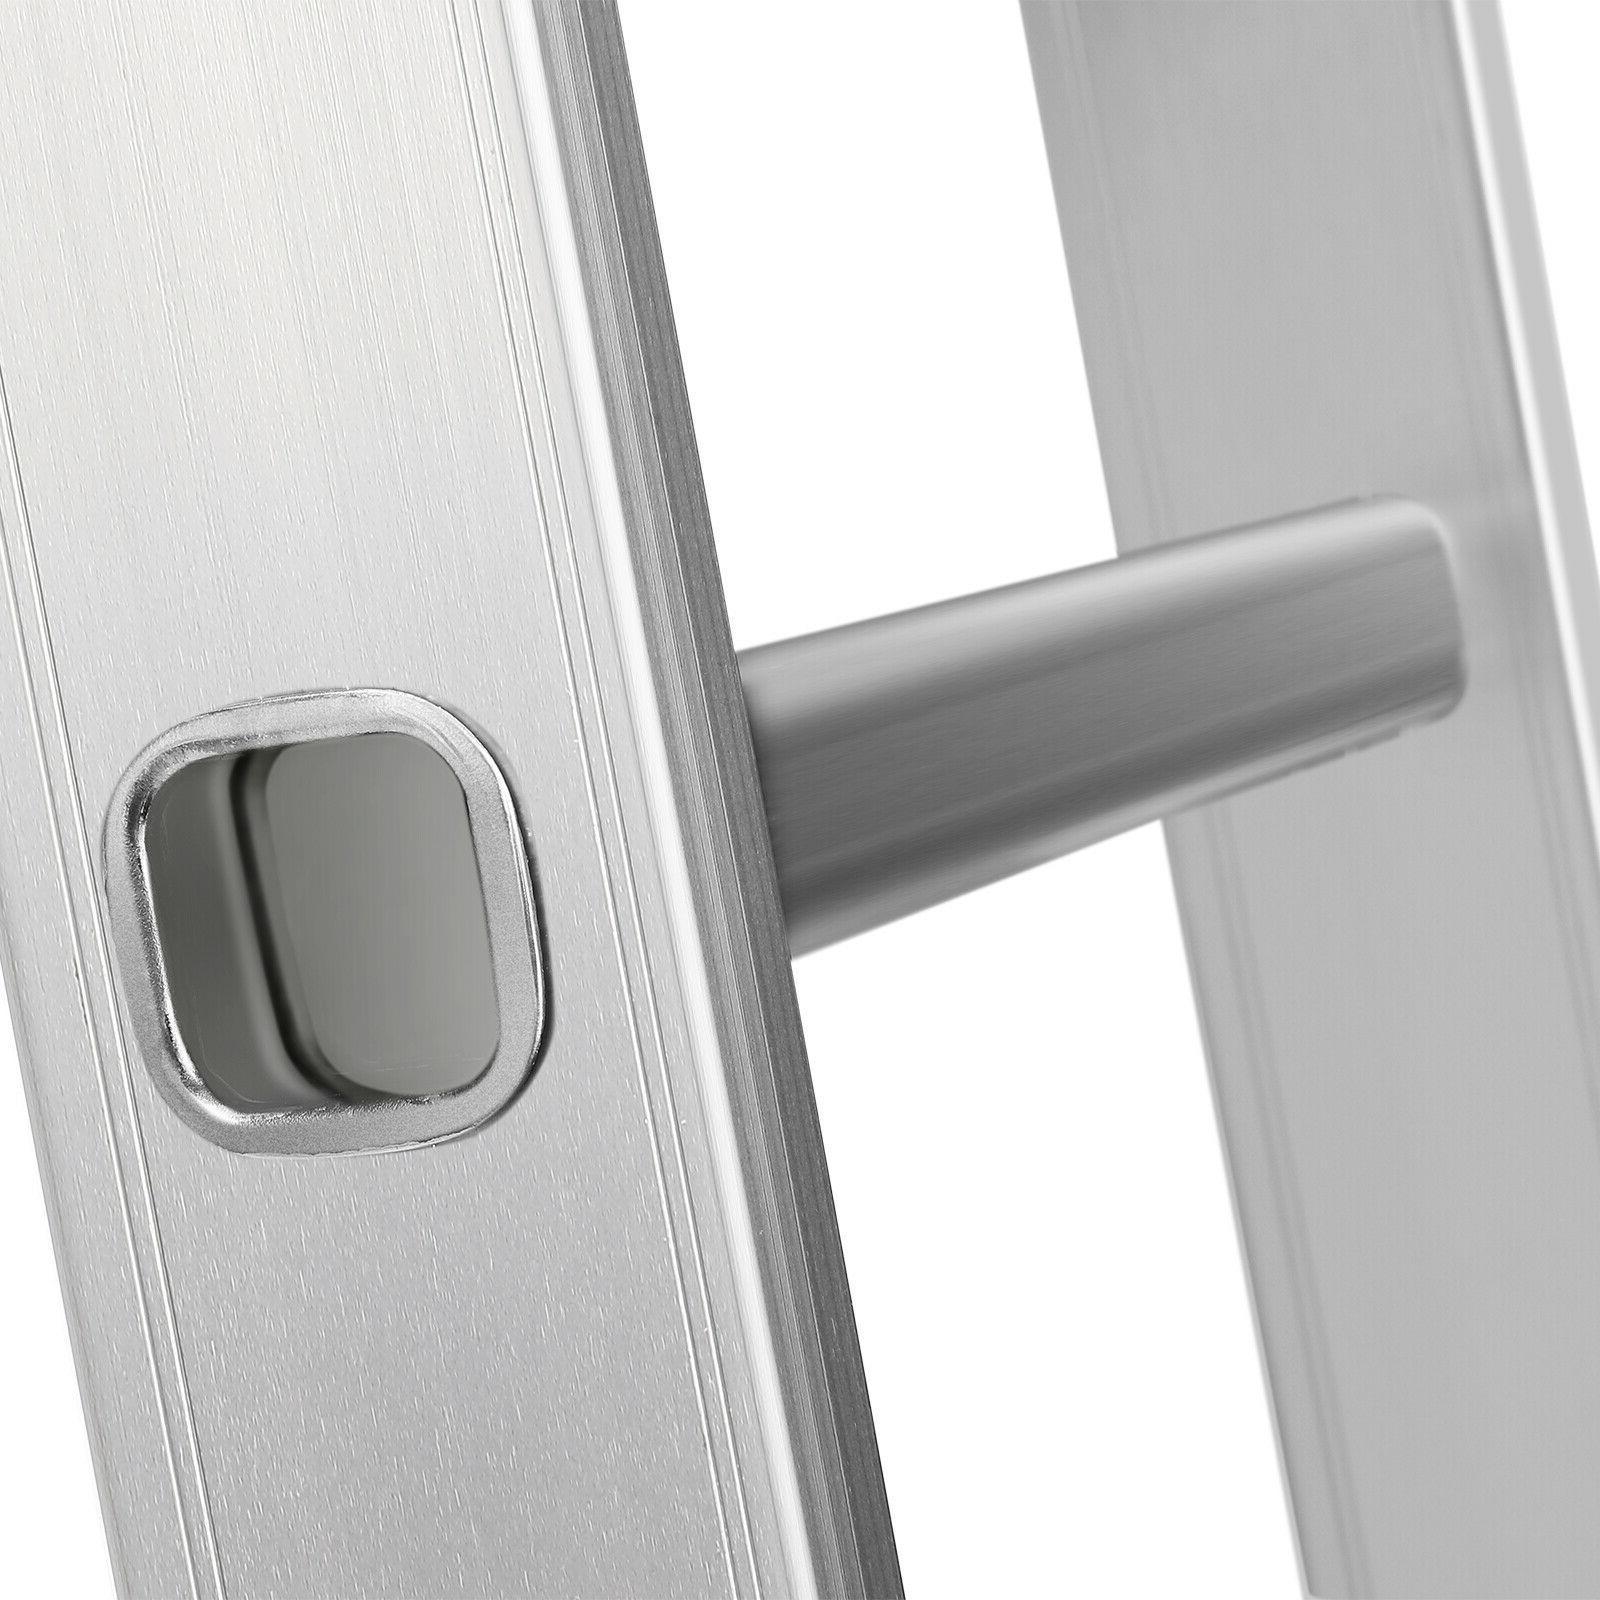 19.5FT Folding Aluminum Multi Function Tool